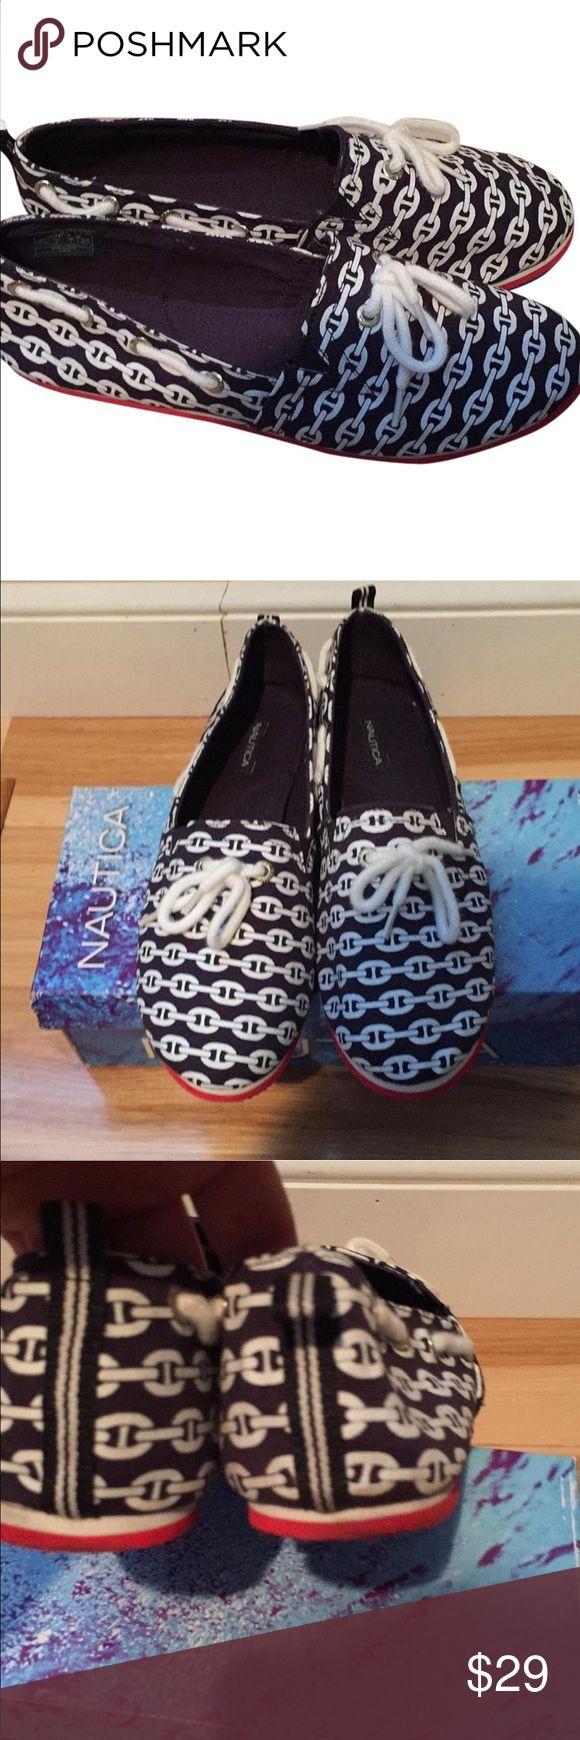 🚨SALE🚨nautica boat shoes ⚓️⚓️ Like new Nautica Shoes Sneakers